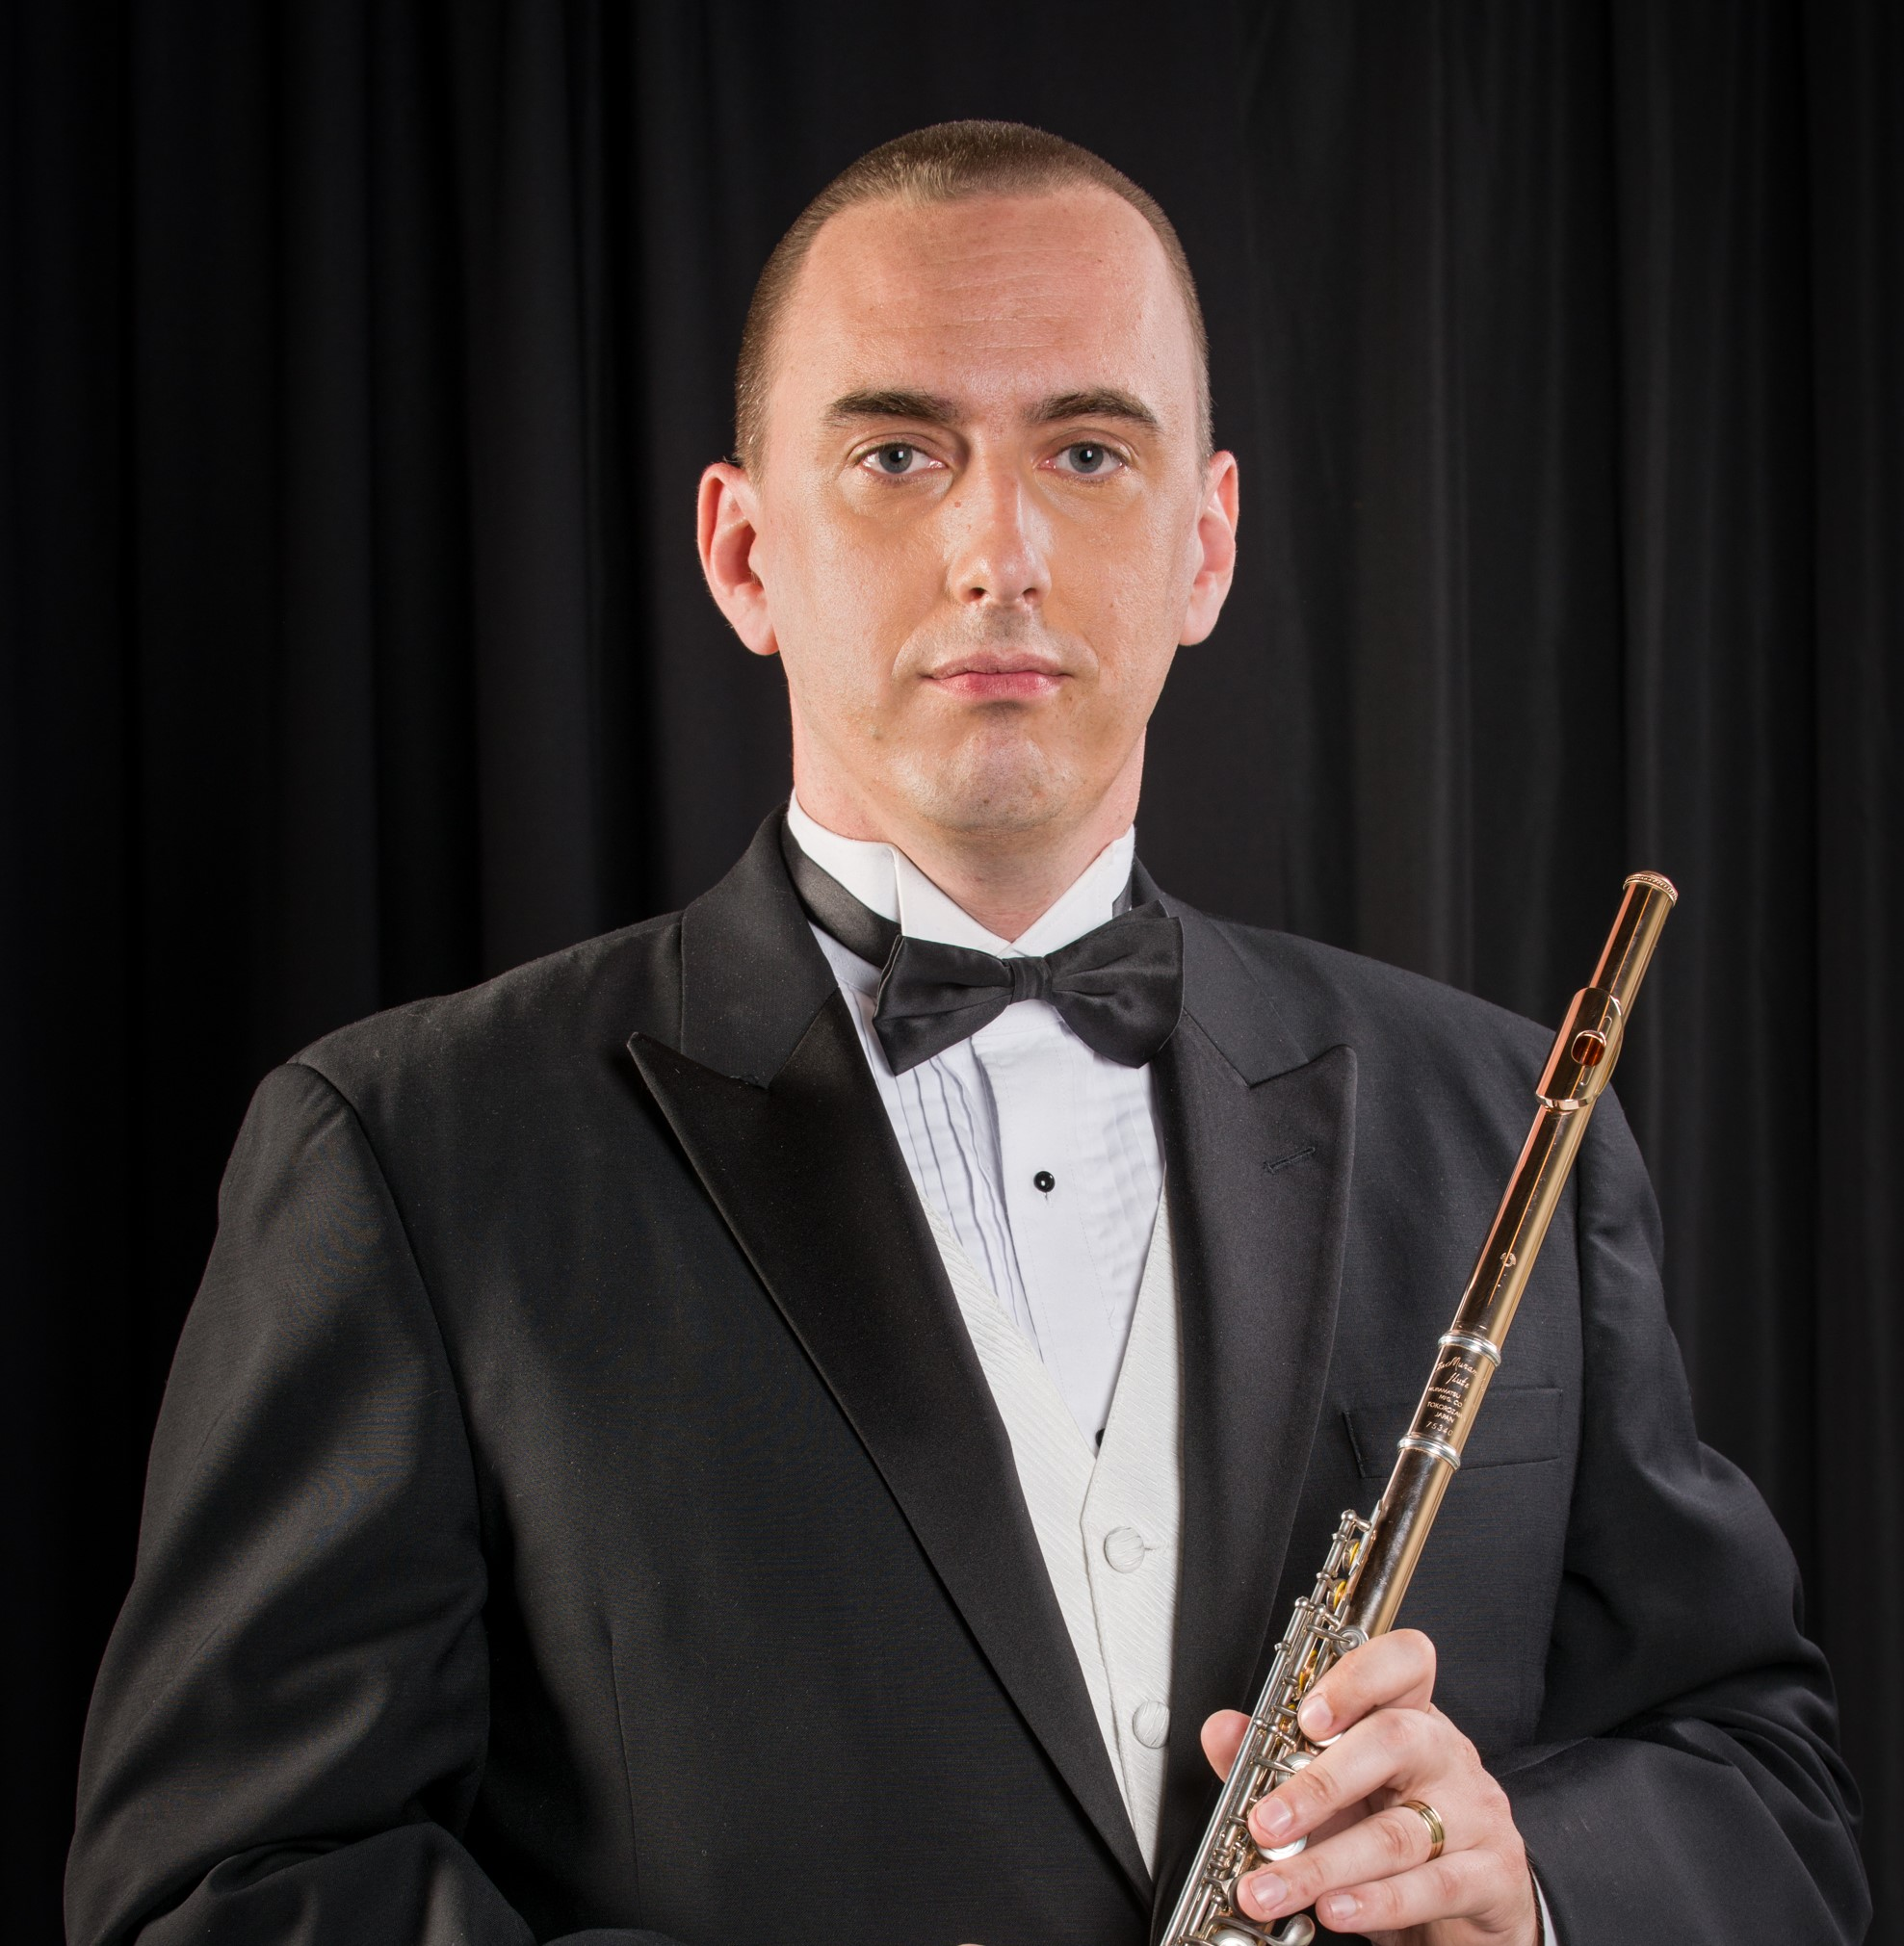 Bernard Blary, Flautist